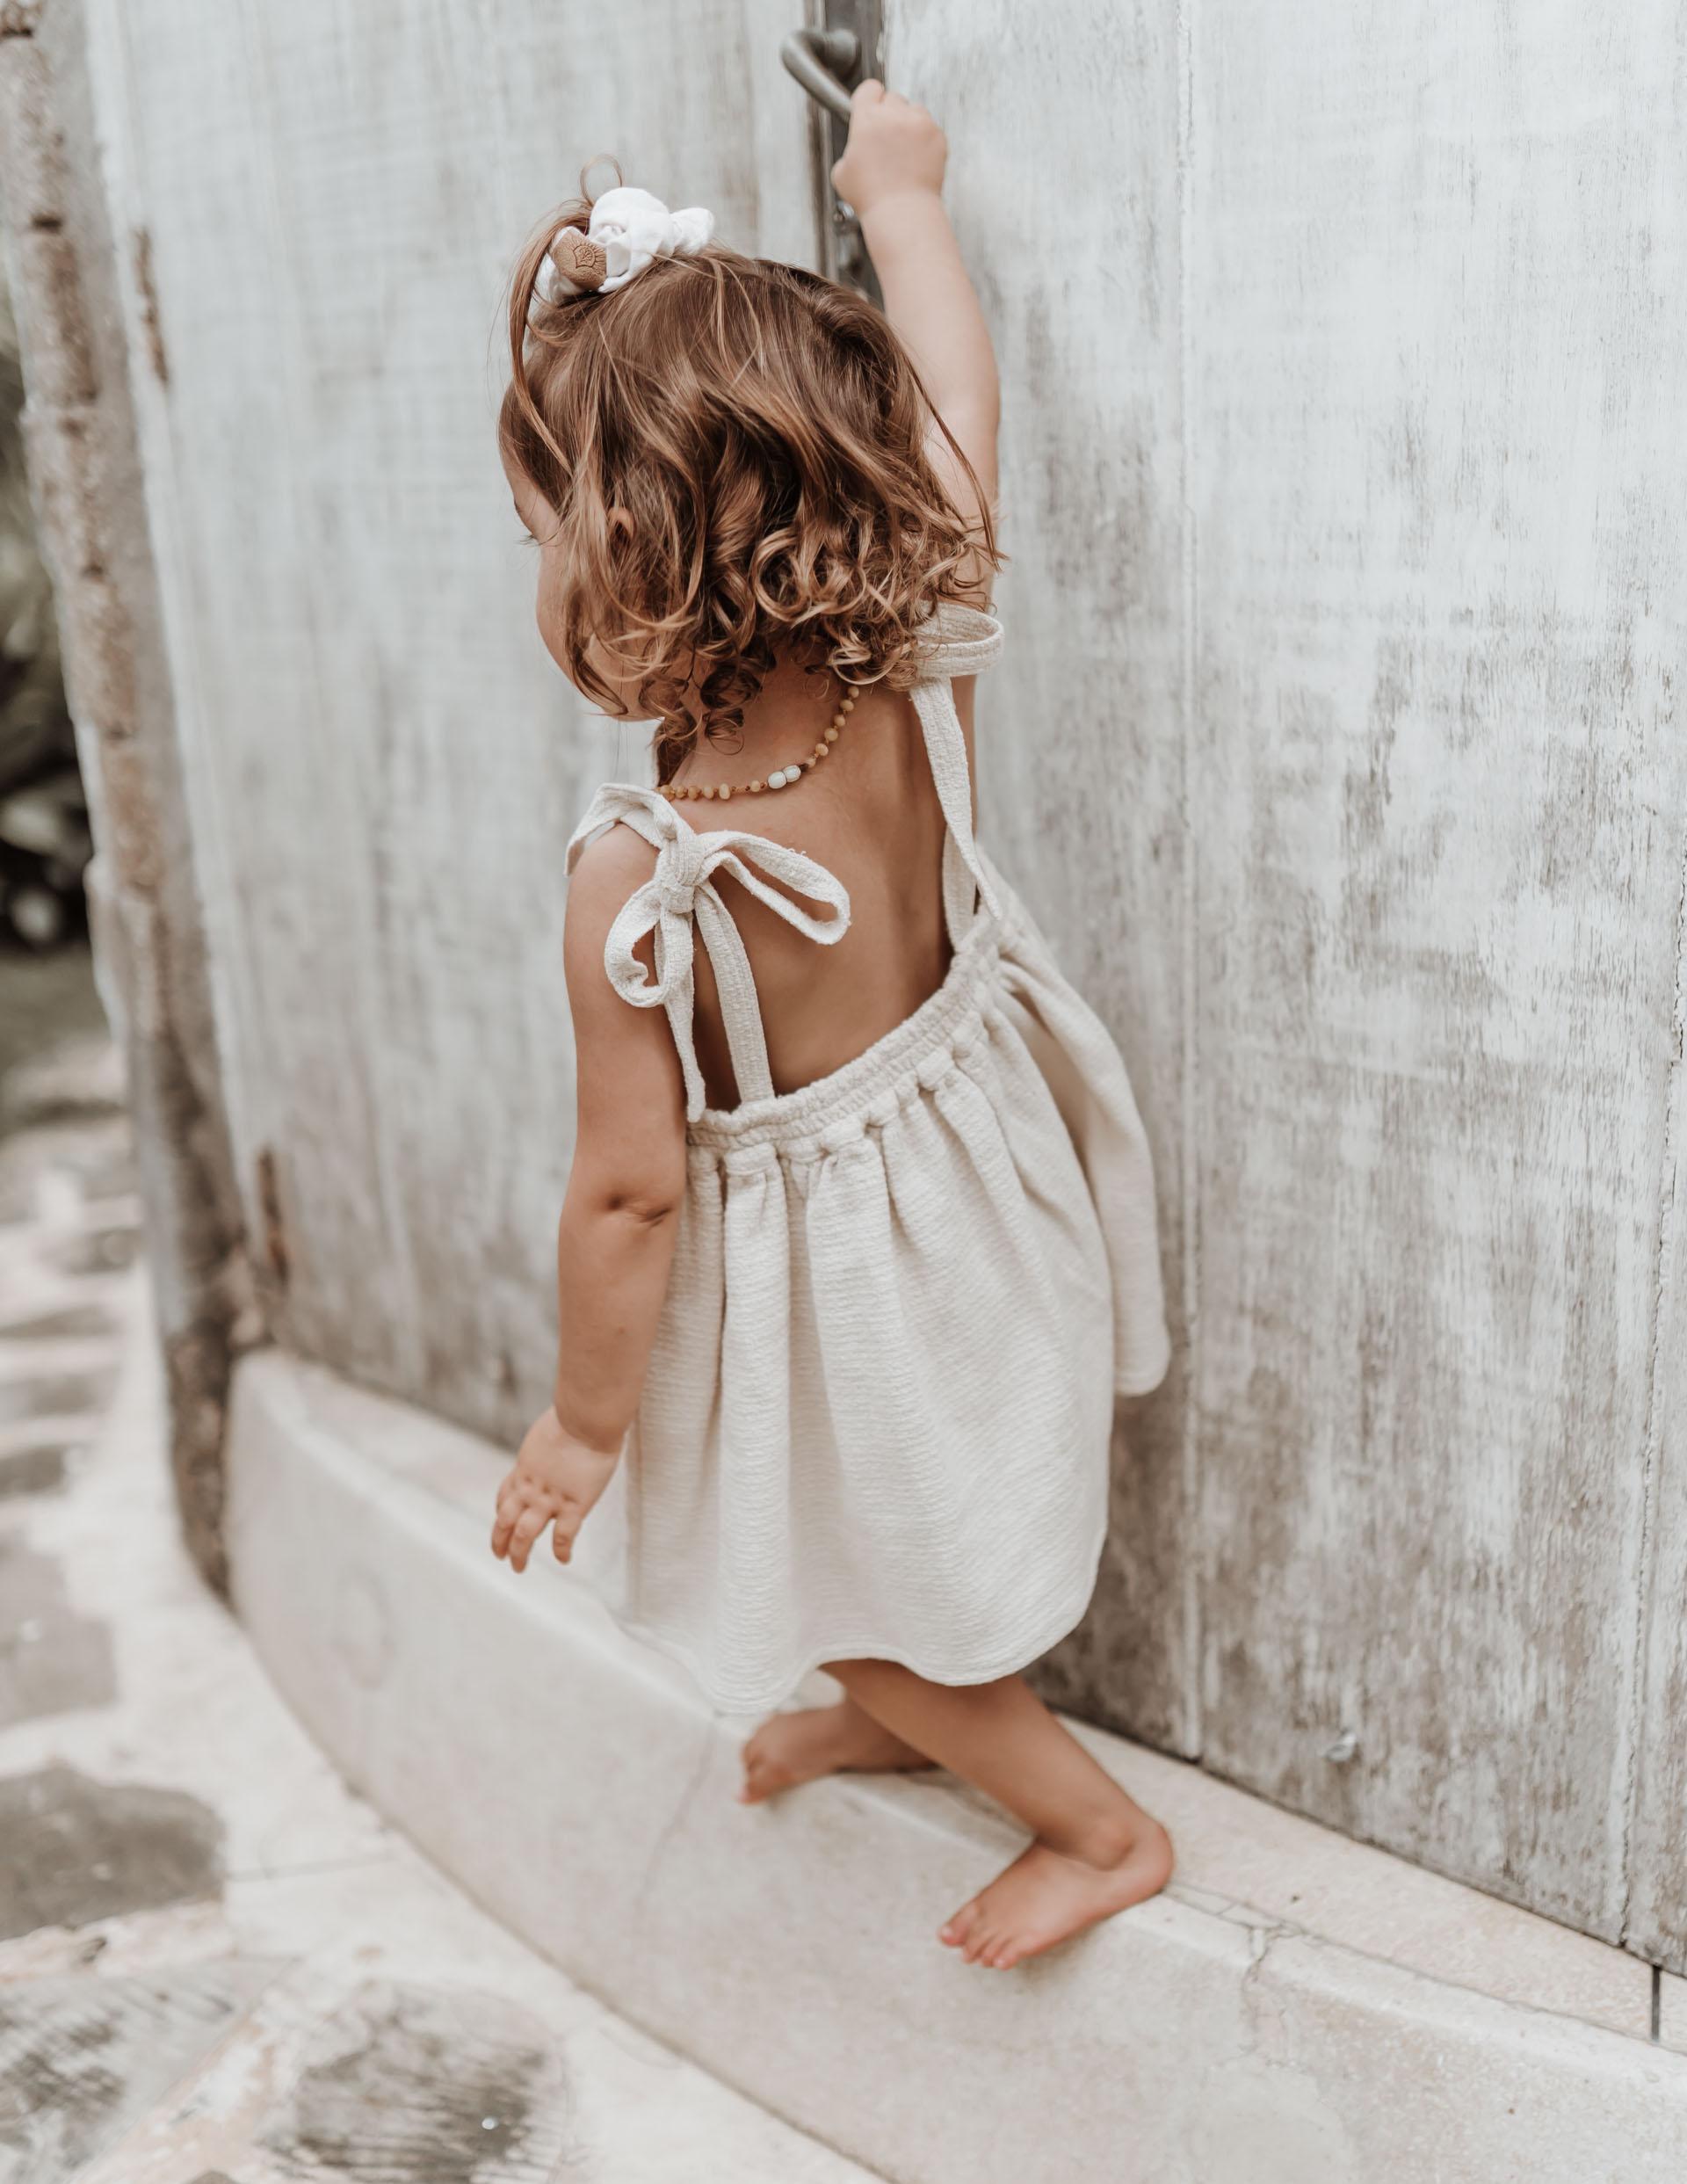 keira-mason-illoura-the-label-girl-in-cute-dress.jpg